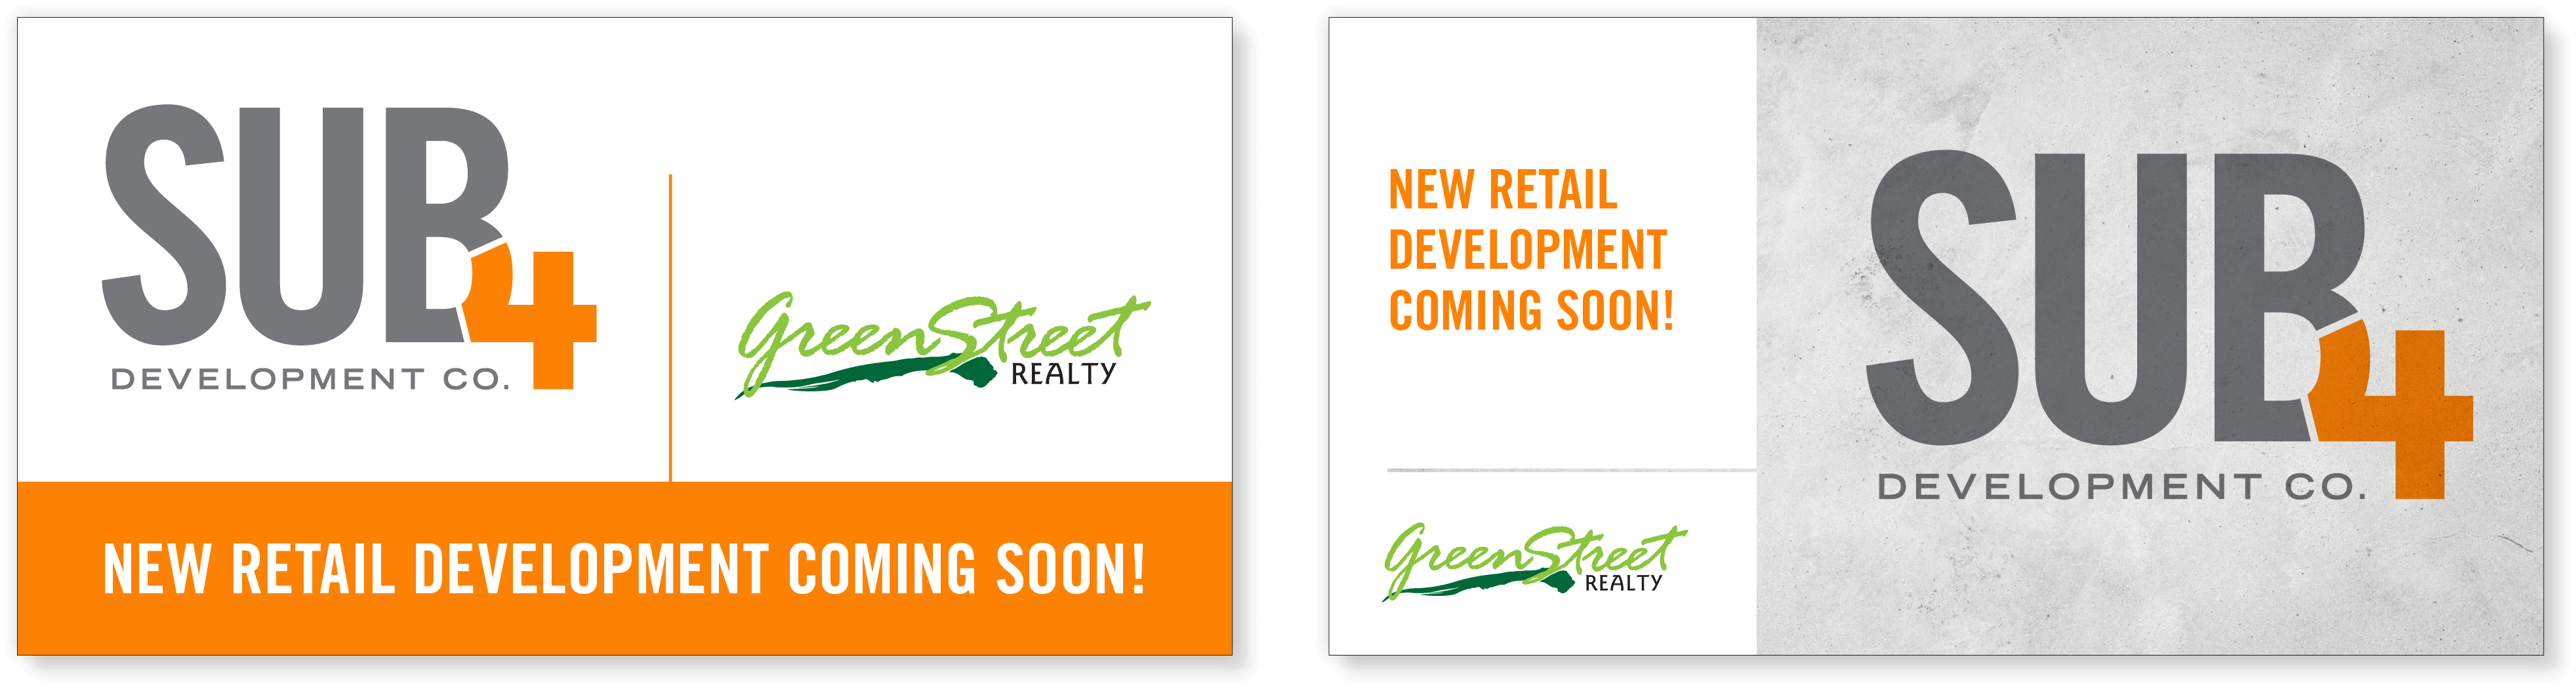 Sub4 Development Company - Branding